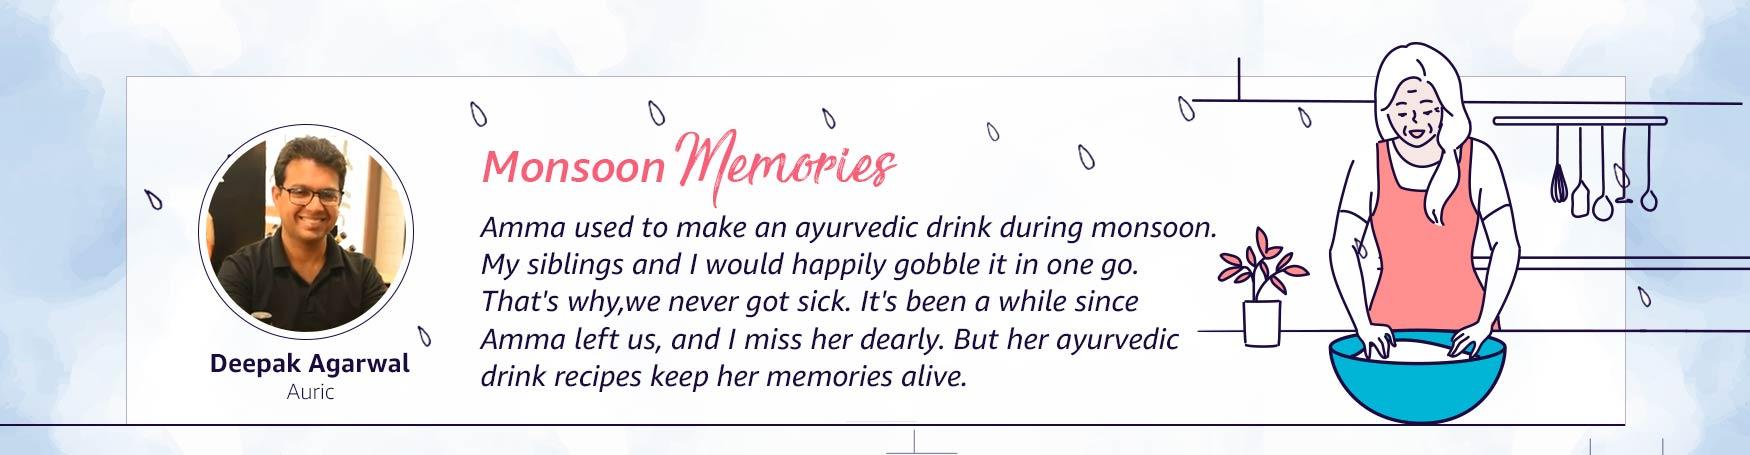 Story-Auric